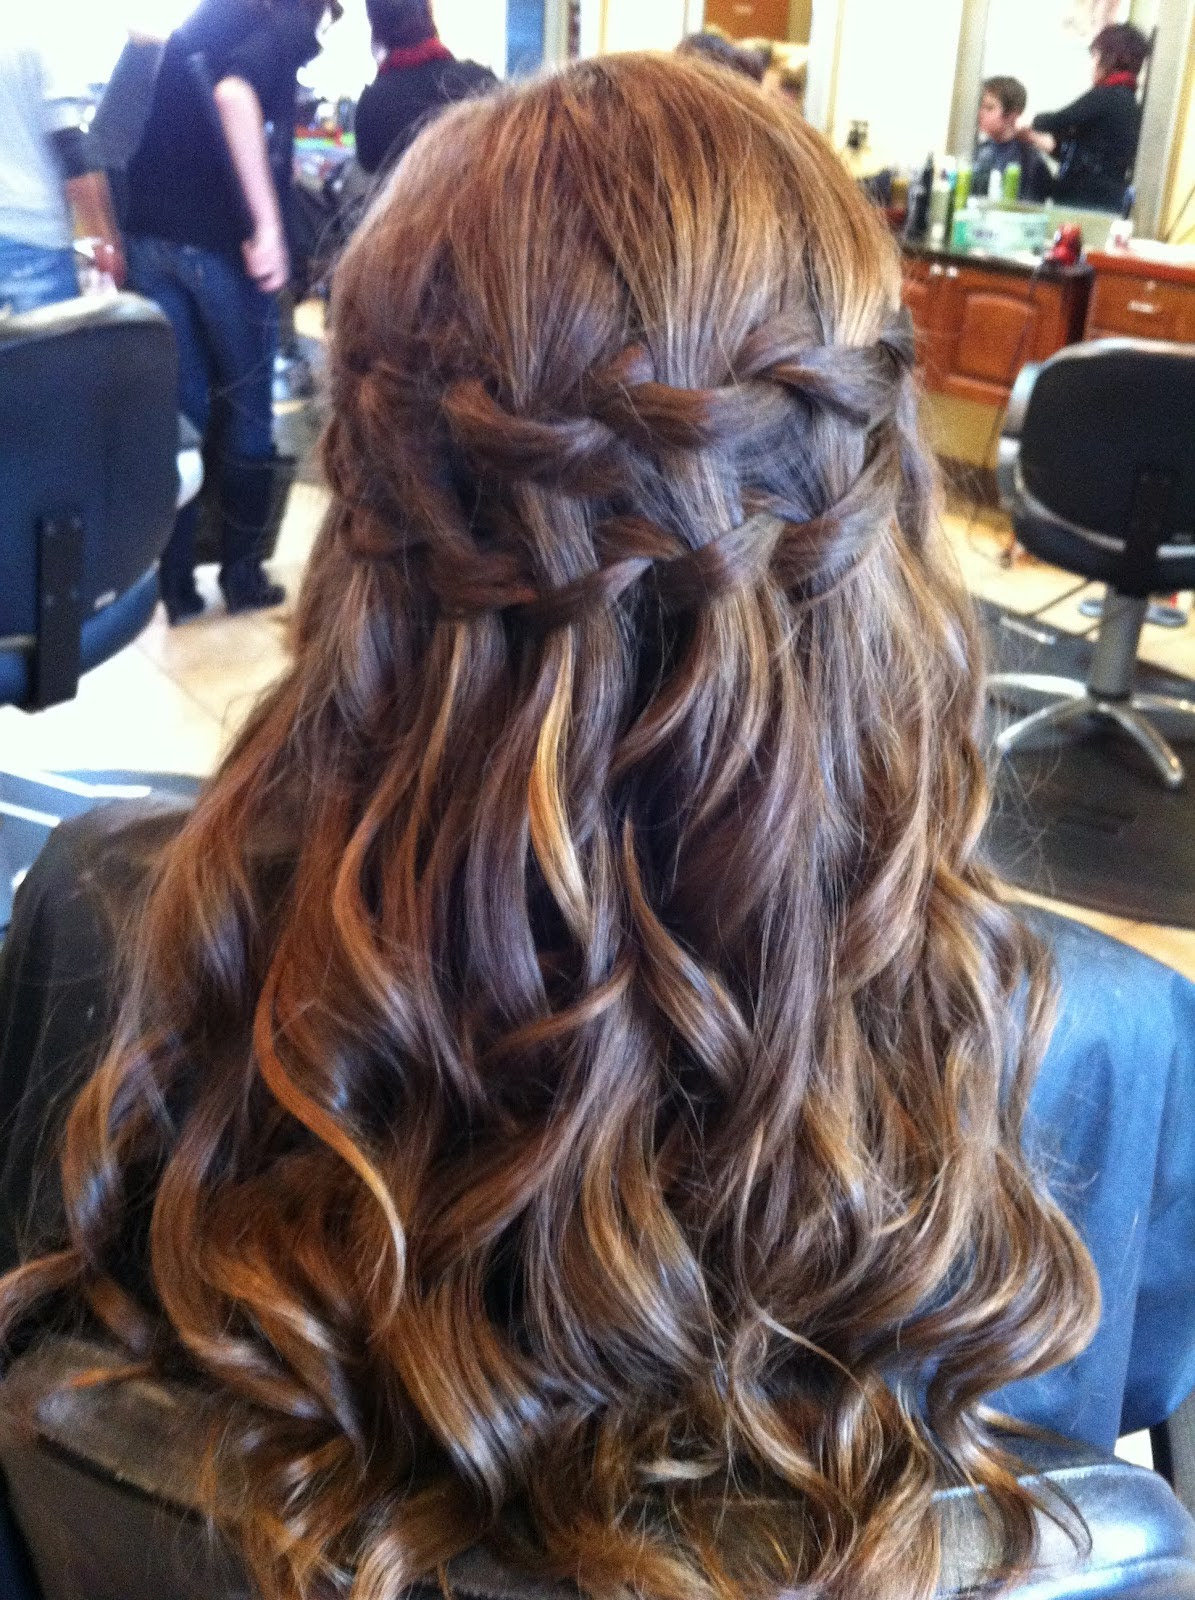 15 Pretty Half-Up Half-Down Hairstyles Ideas - fashionsy.com